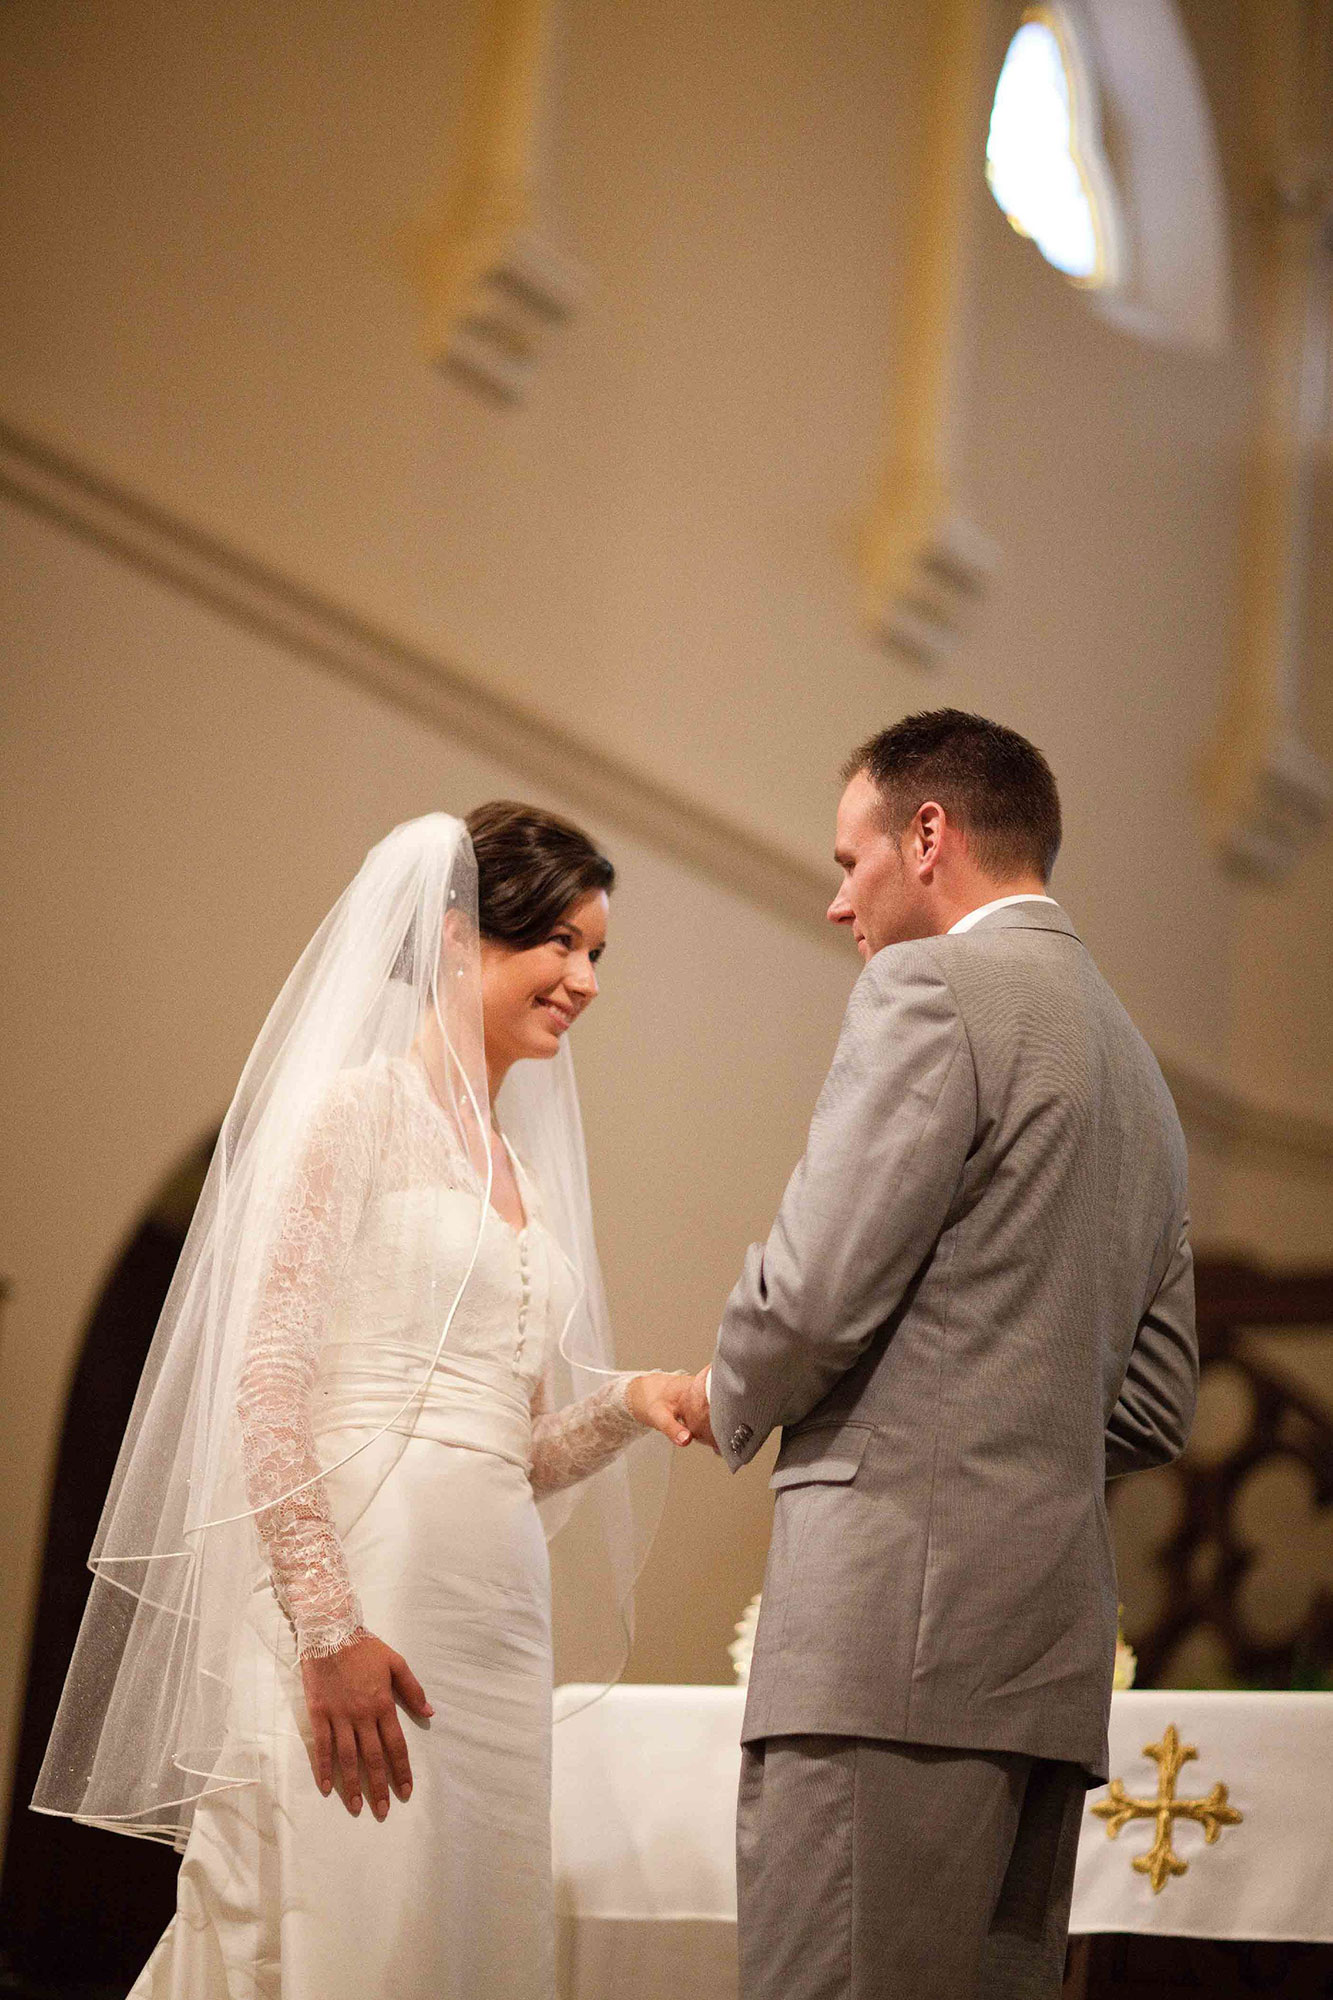 Amanda-Cowley-Willowbank-Vineyard-Bride-Photo-By-White-Photographie-007.jpg